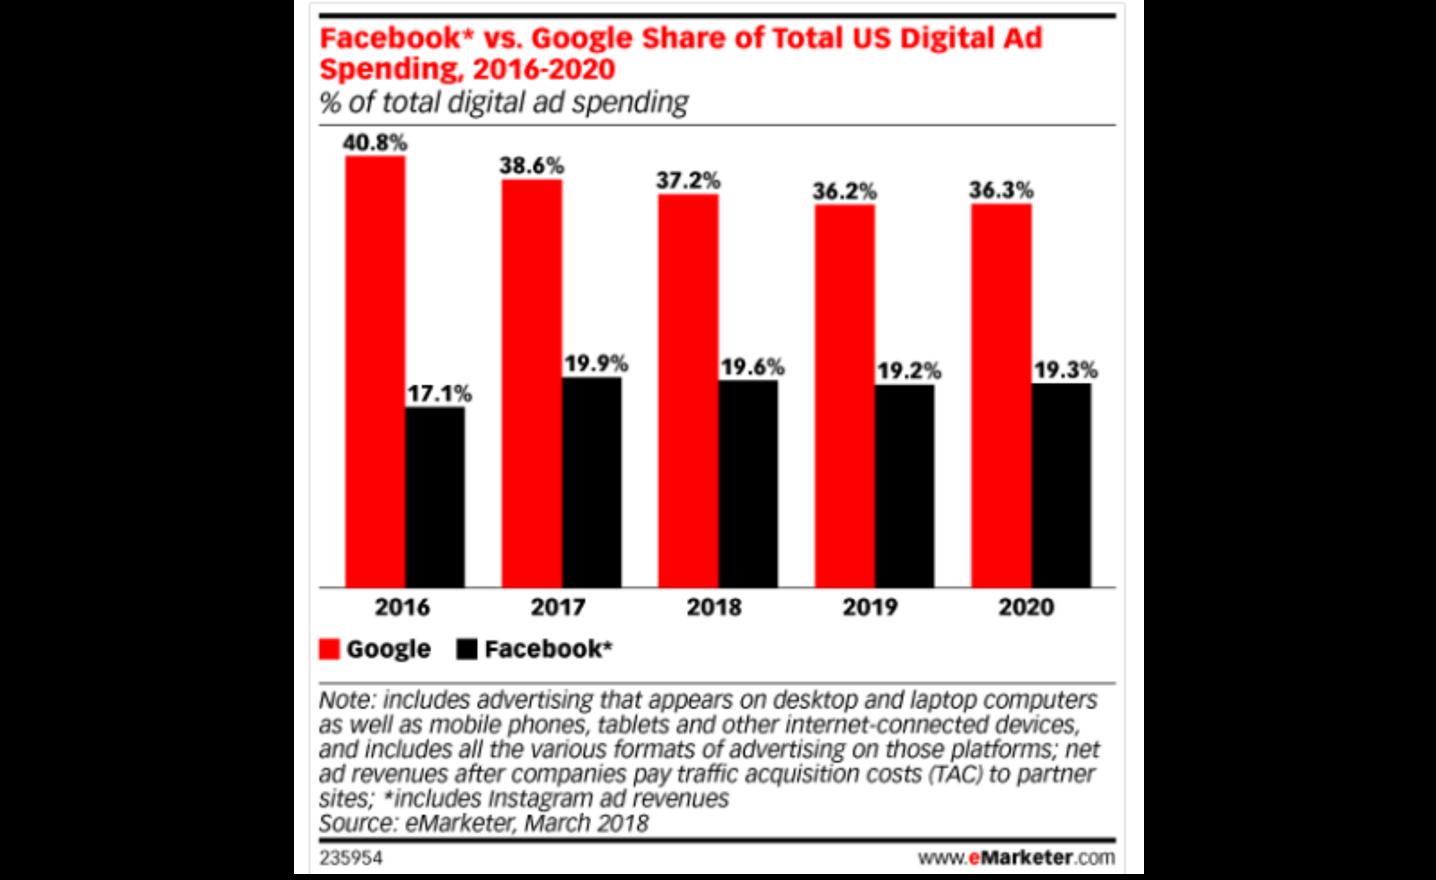 Graph showing Facebook vs Google share of total US digital ad spending 2016-2020